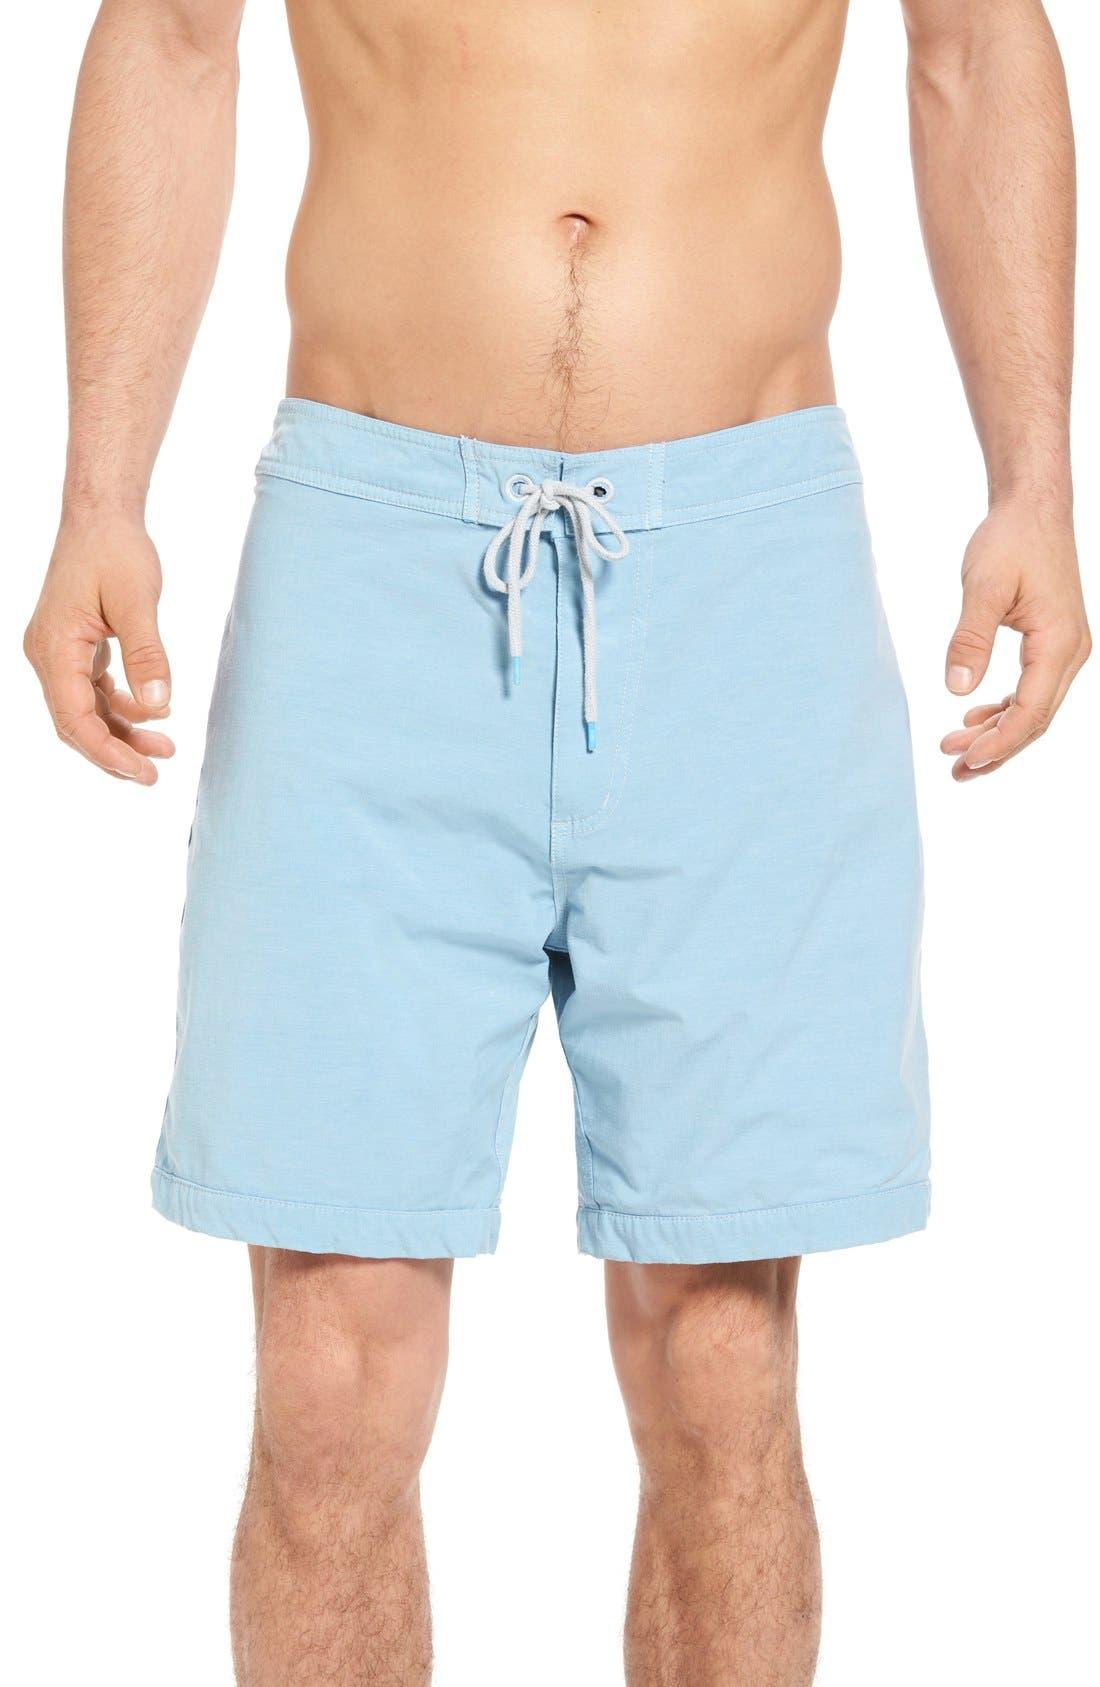 Venice Board Shorts,                             Main thumbnail 1, color,                             Light Blue